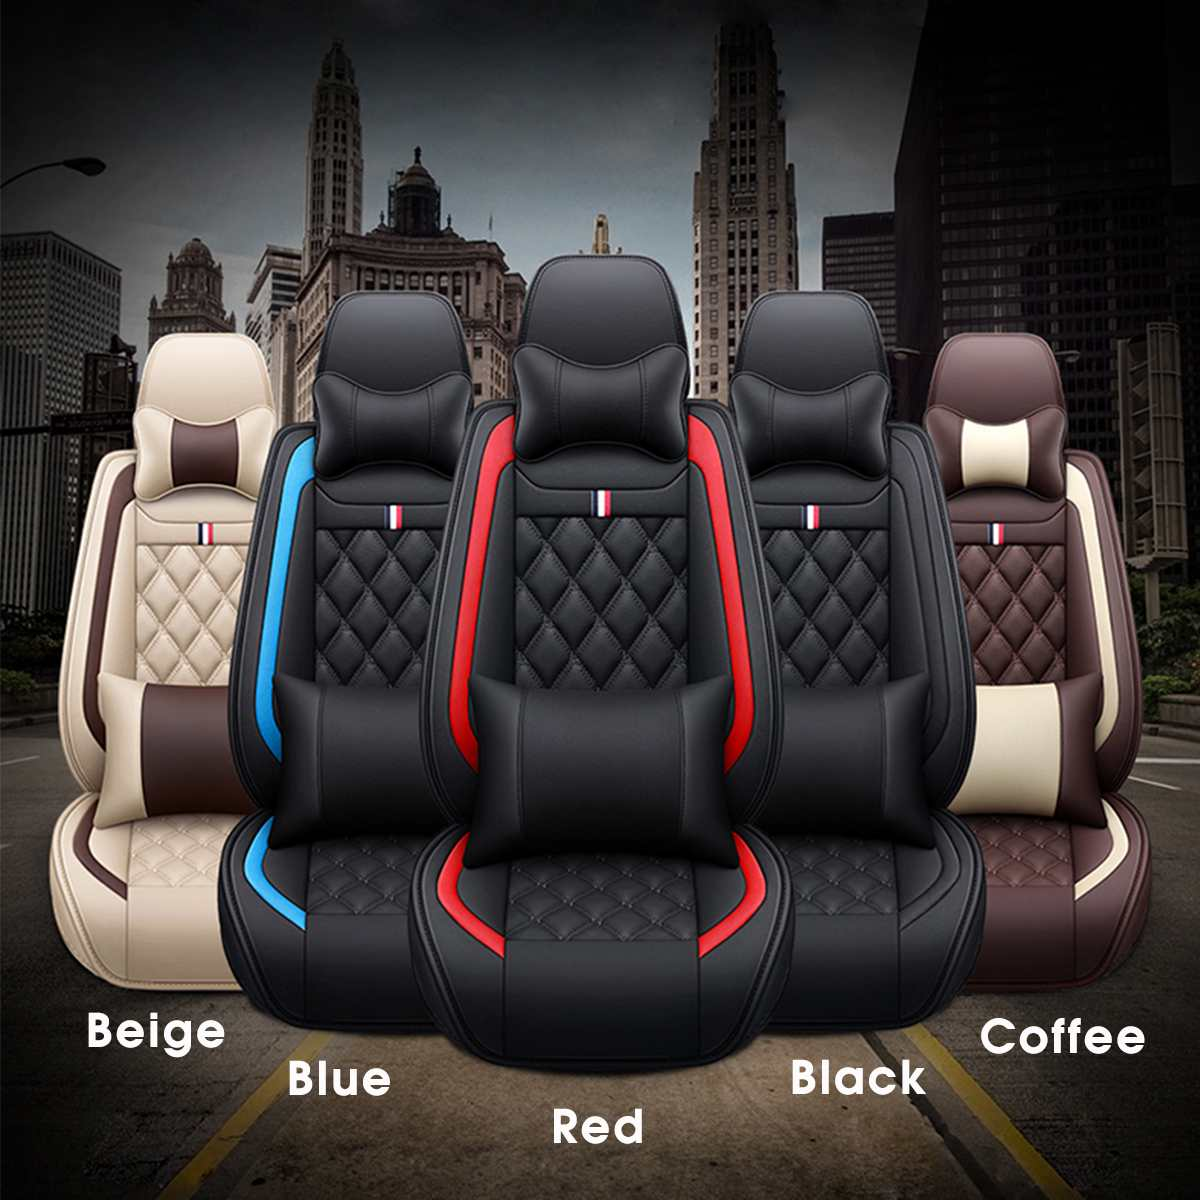 Luxus PU Leder Auto Sitz CoverUniversal Automobil Sitz Pad Mit 2 Kopfstützen Kissen